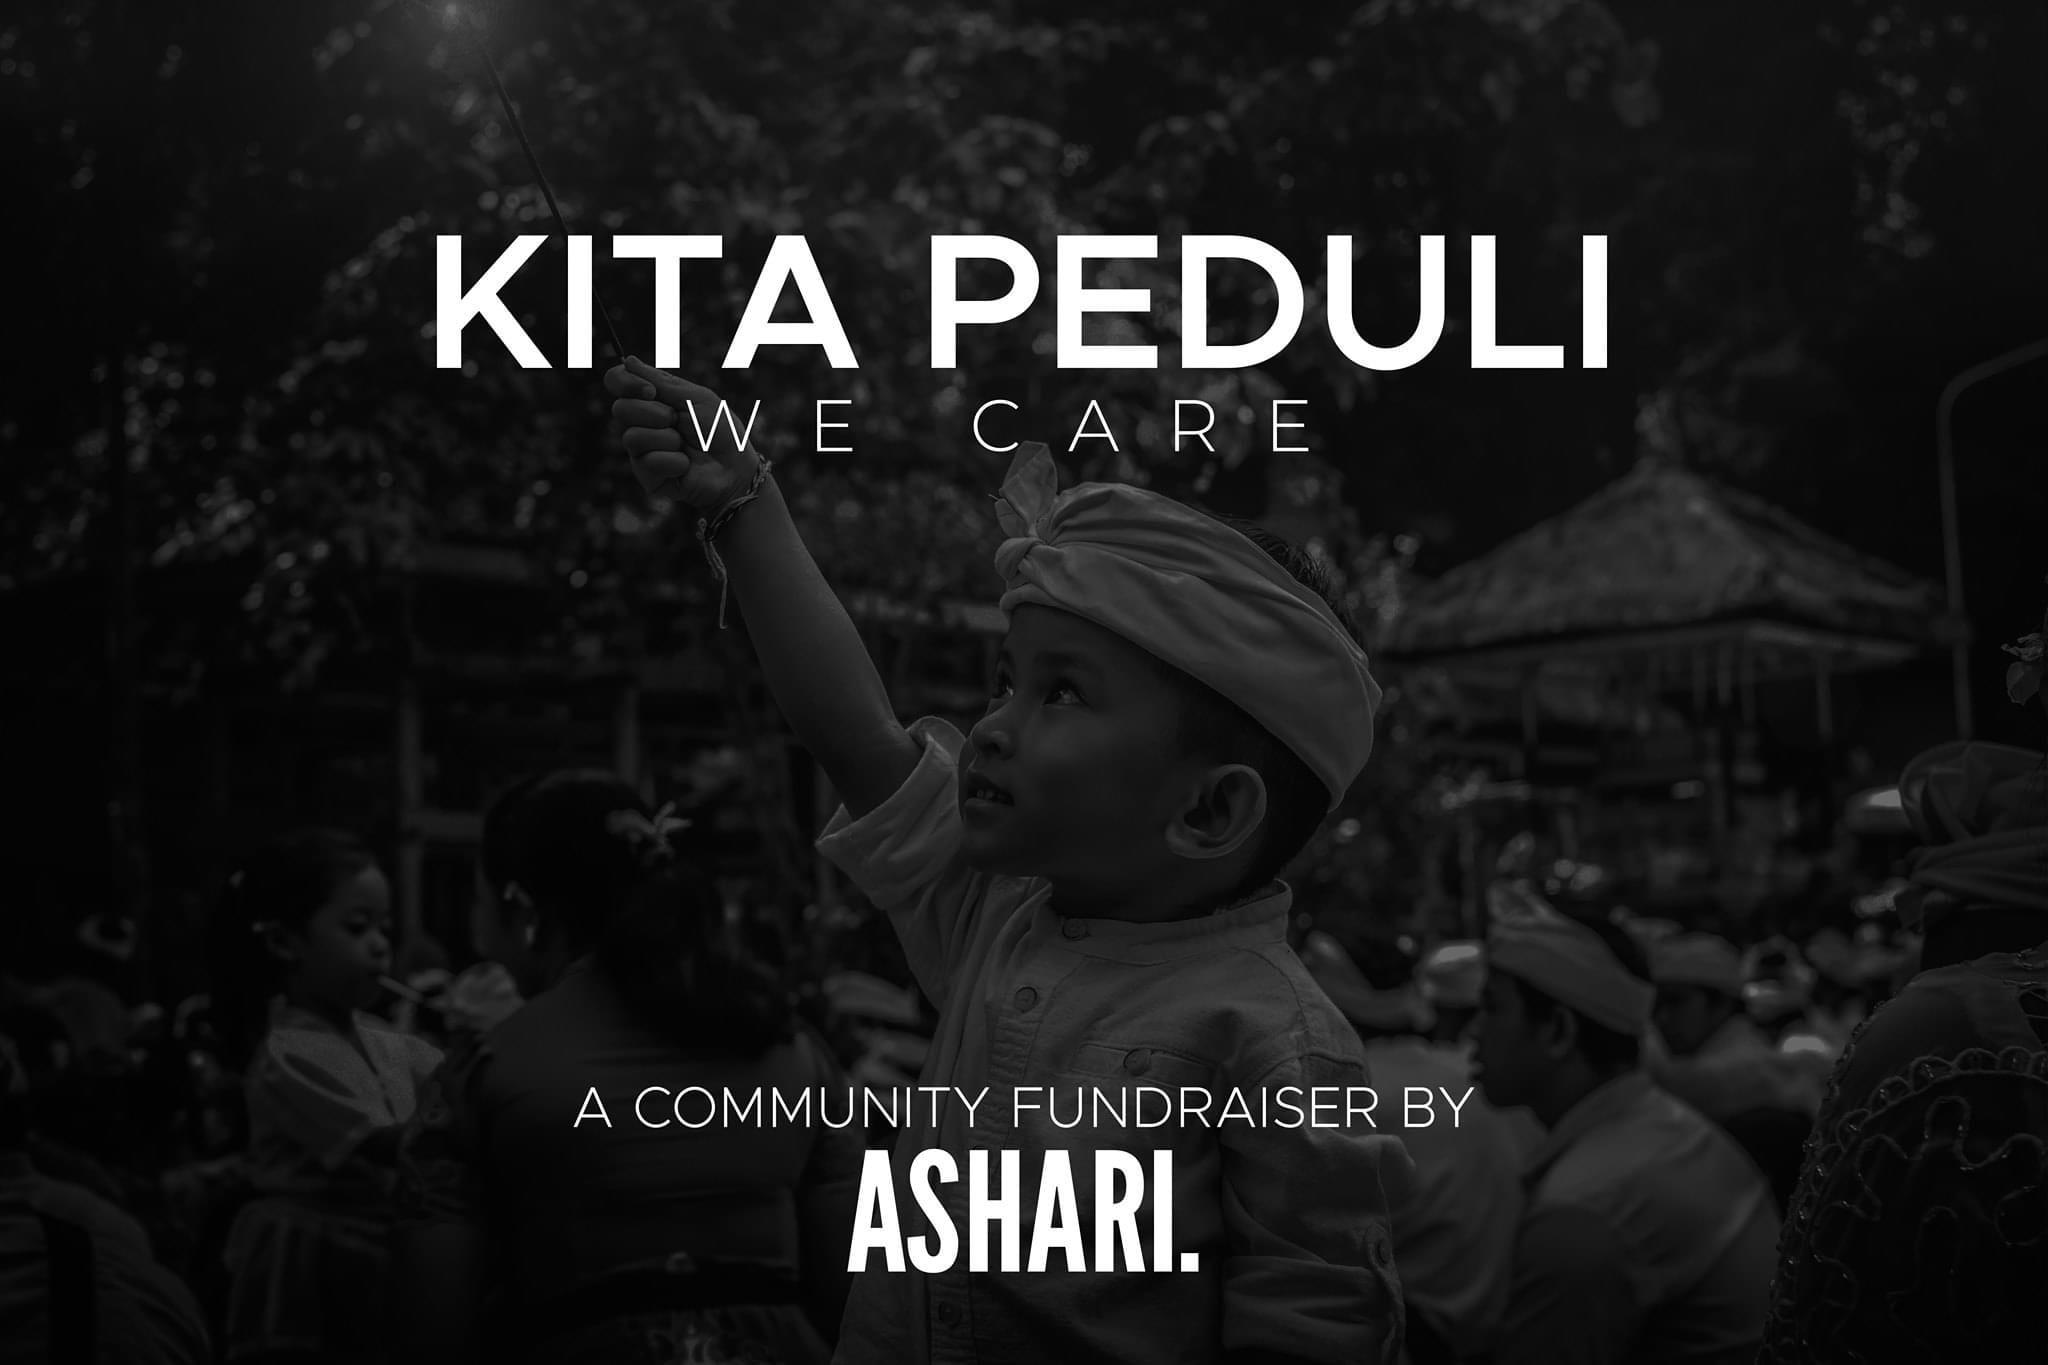 Kita Peduli – We Care